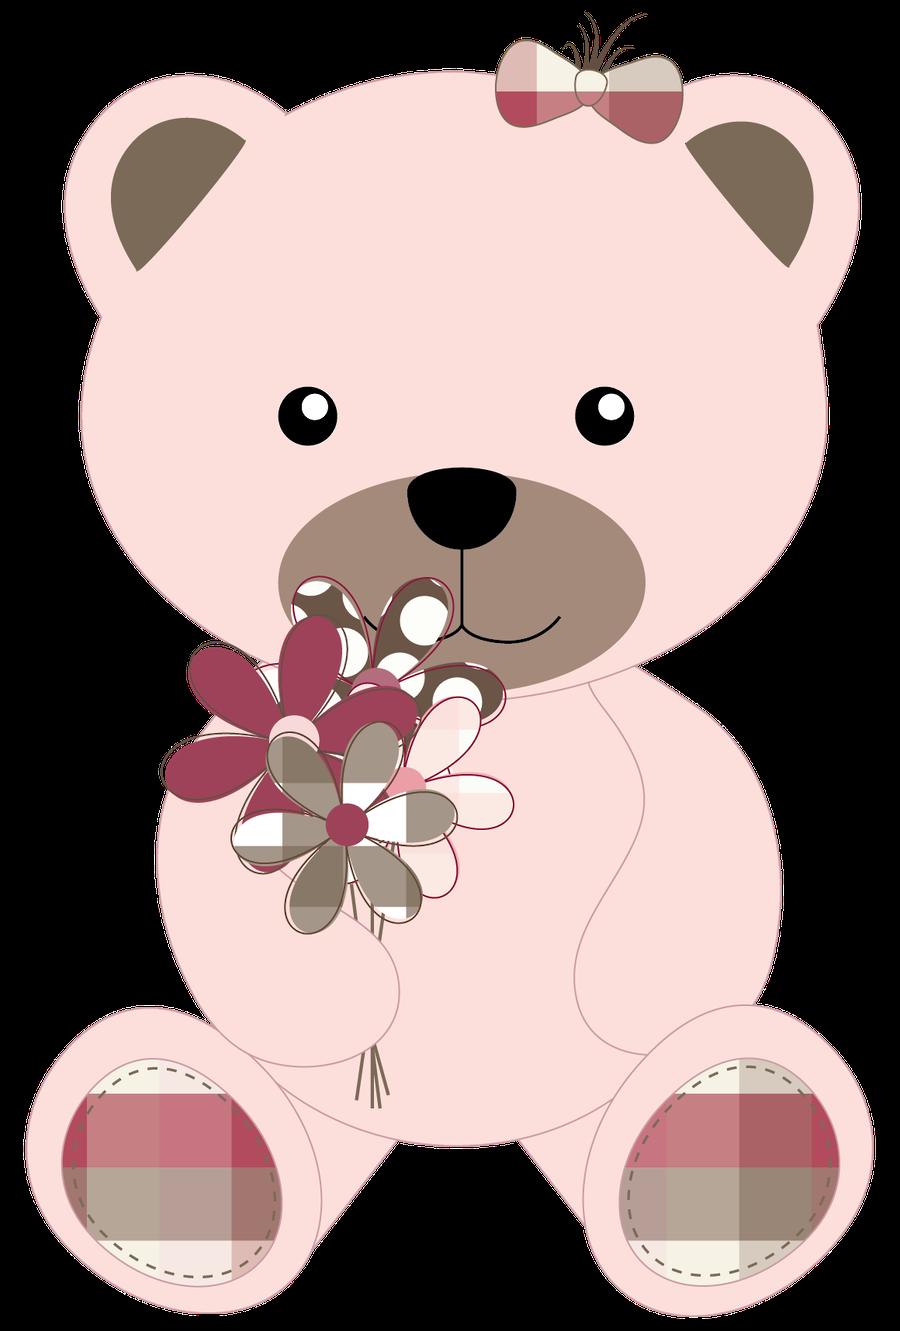 Http Danimfalcao Minus Com Mygimocebbww Teddy Bear Images Kids Cartoon Characters Kids Scrapbook